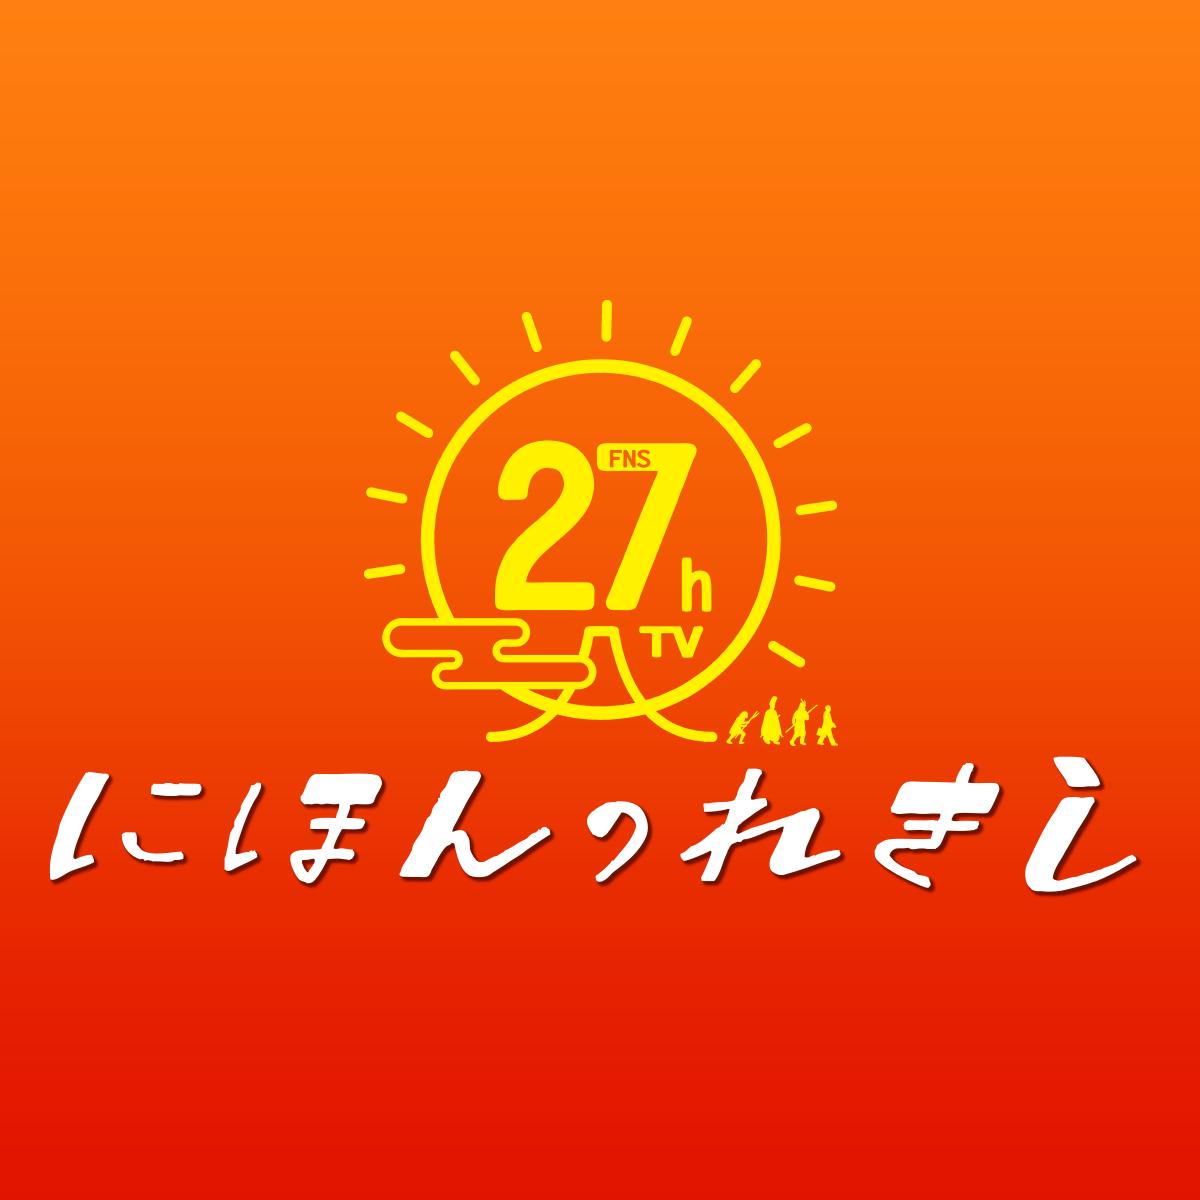 FNS27時間テレビ にほんのれきし - フジテレビ